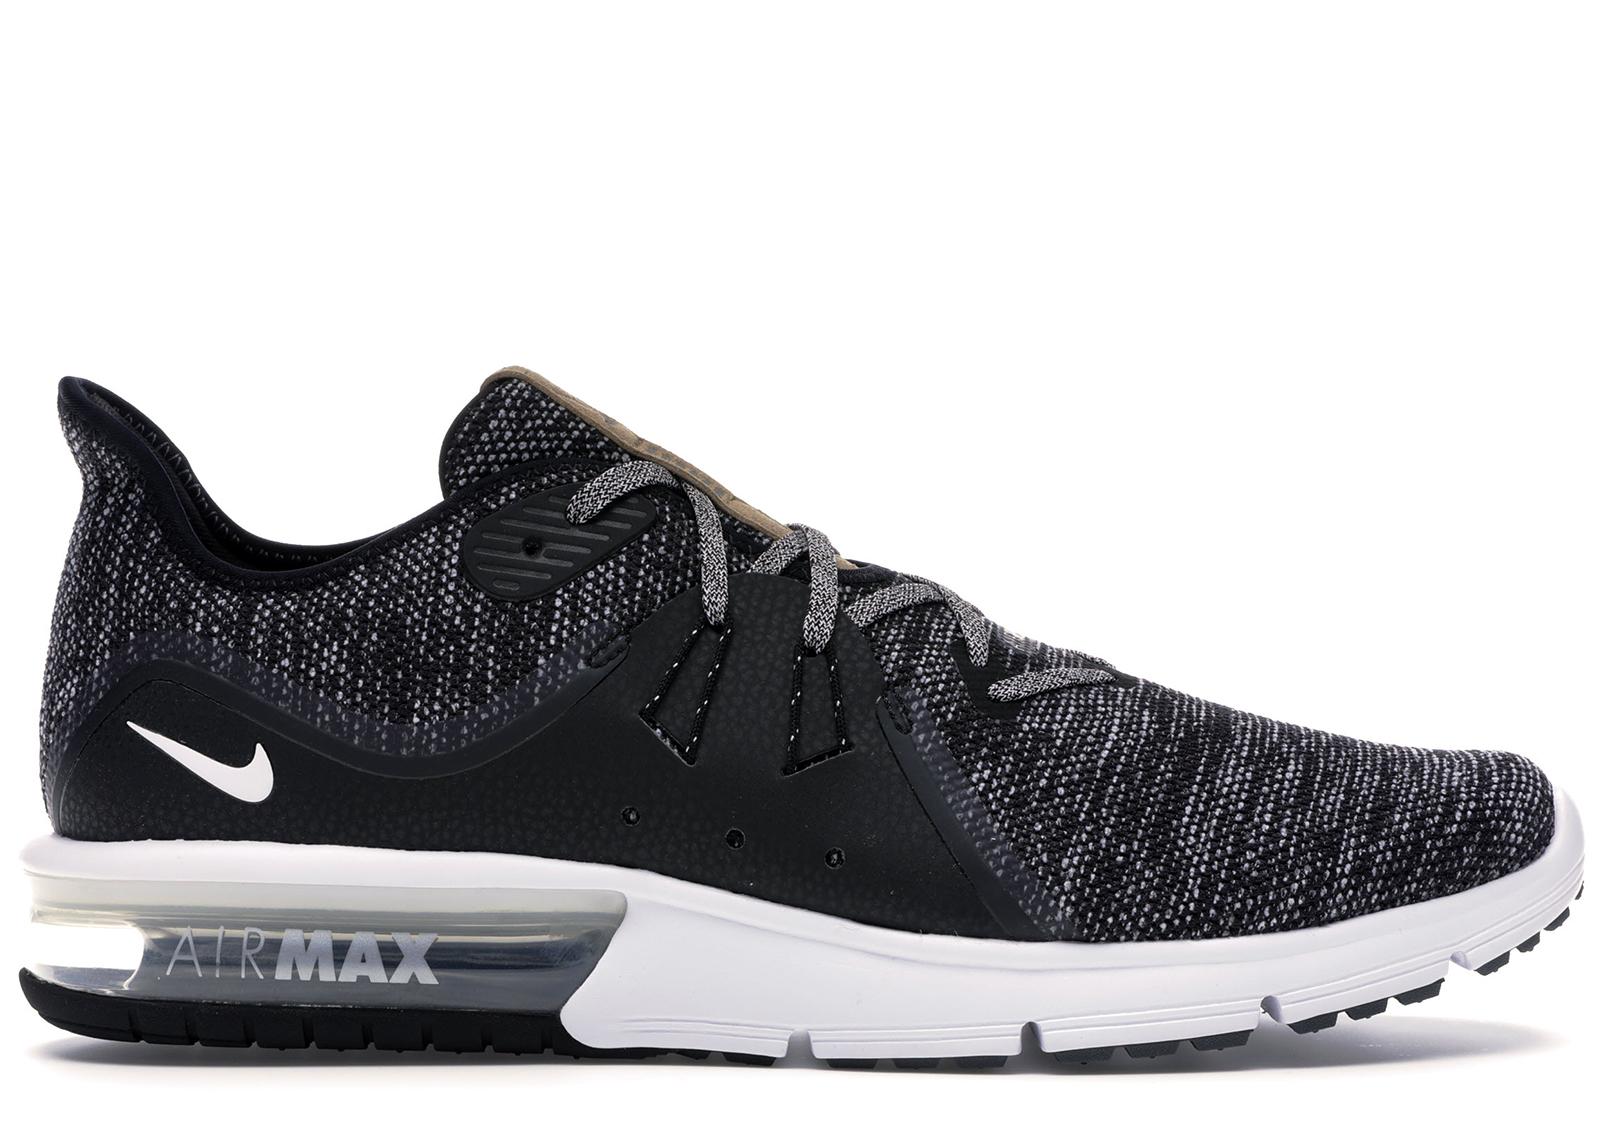 Nike Air Max Sequent 3 Black White-Dark Grey - 921694-011